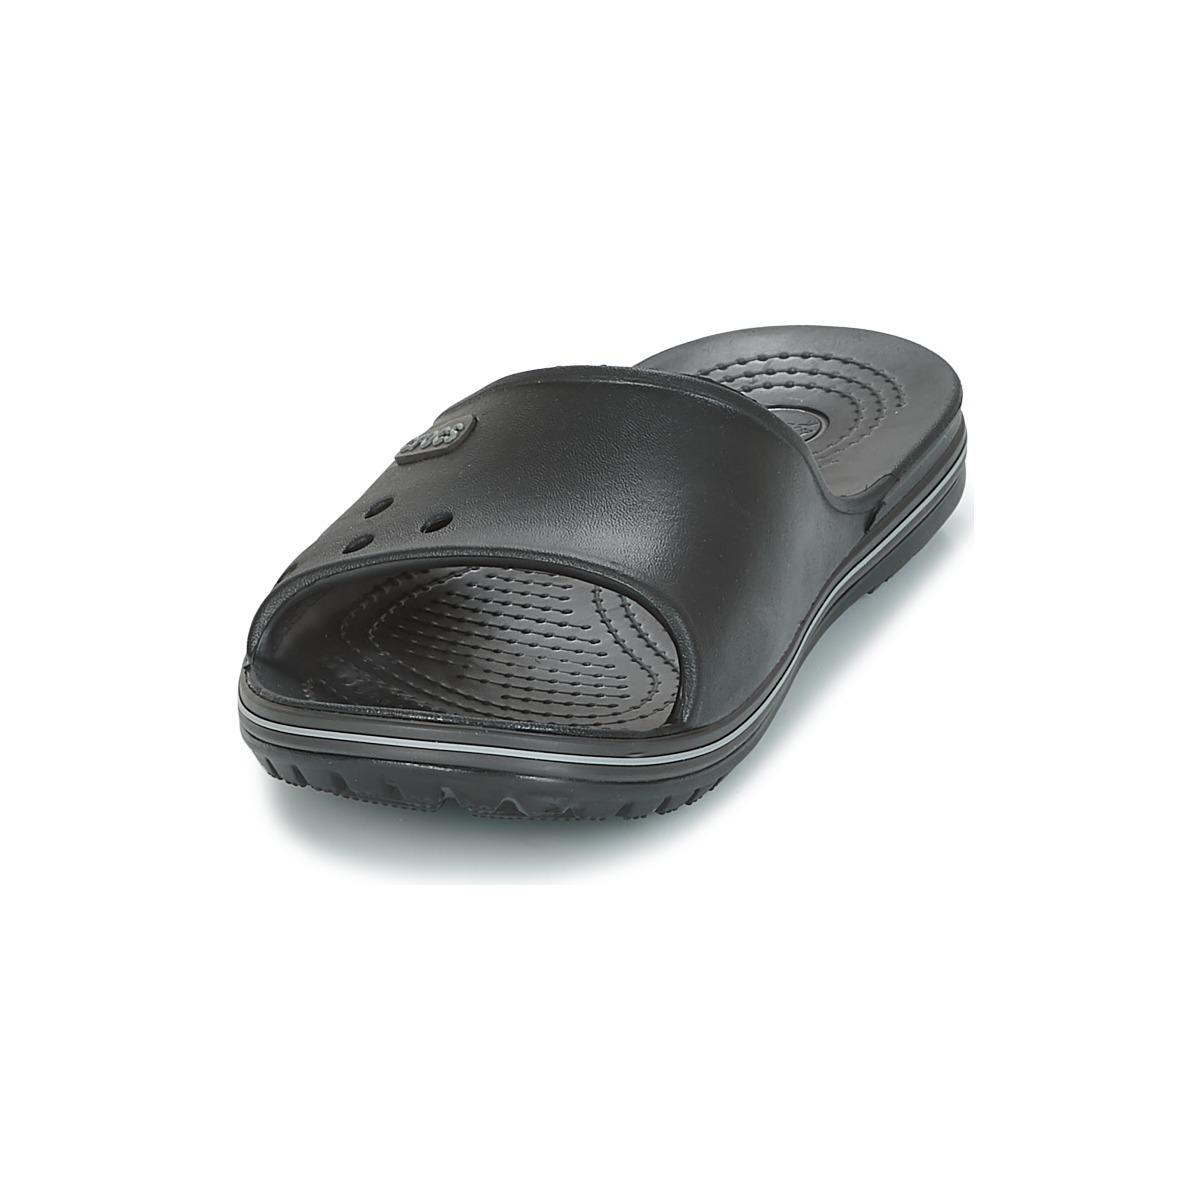 a53e67dbf7bc Crocs™ - Crocband Ii Slide Men s Sandals In Black for Men - Lyst. View  fullscreen